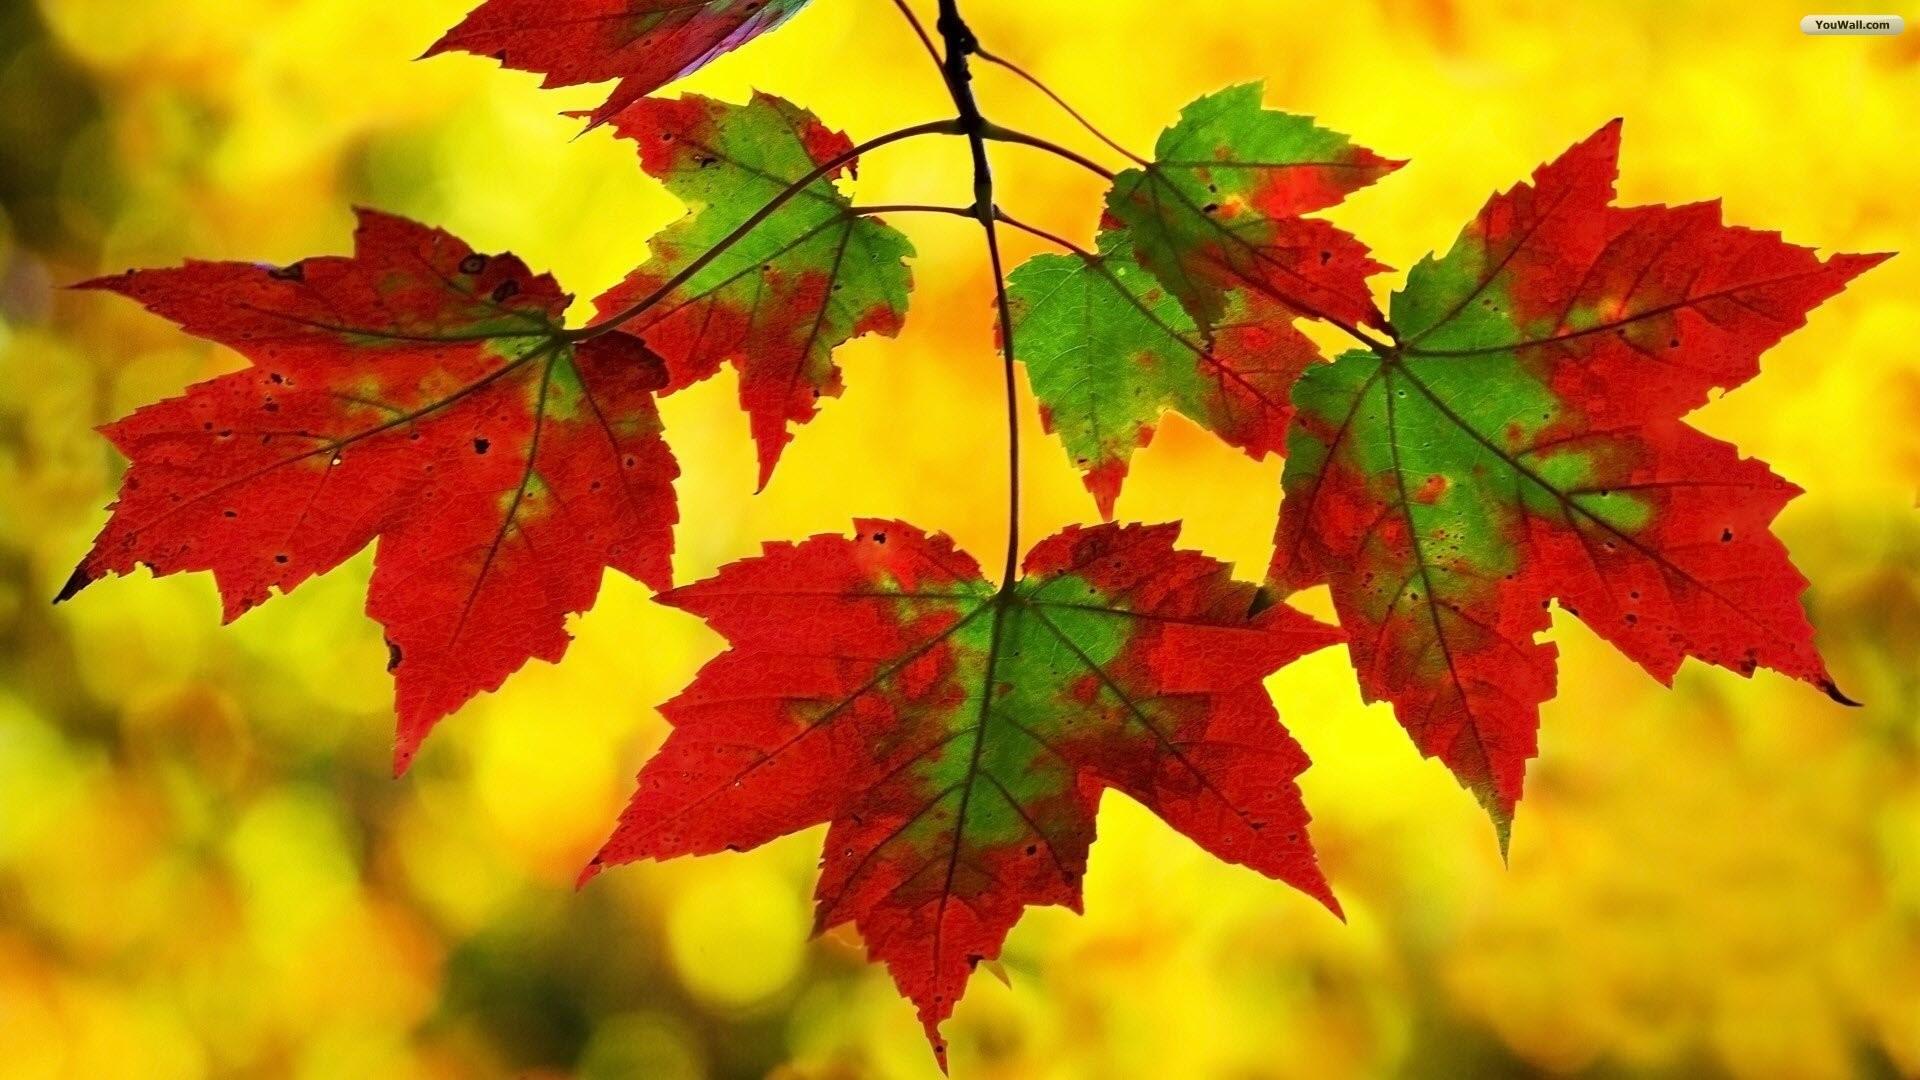 Wallpaper Autumn Leaves ·â'